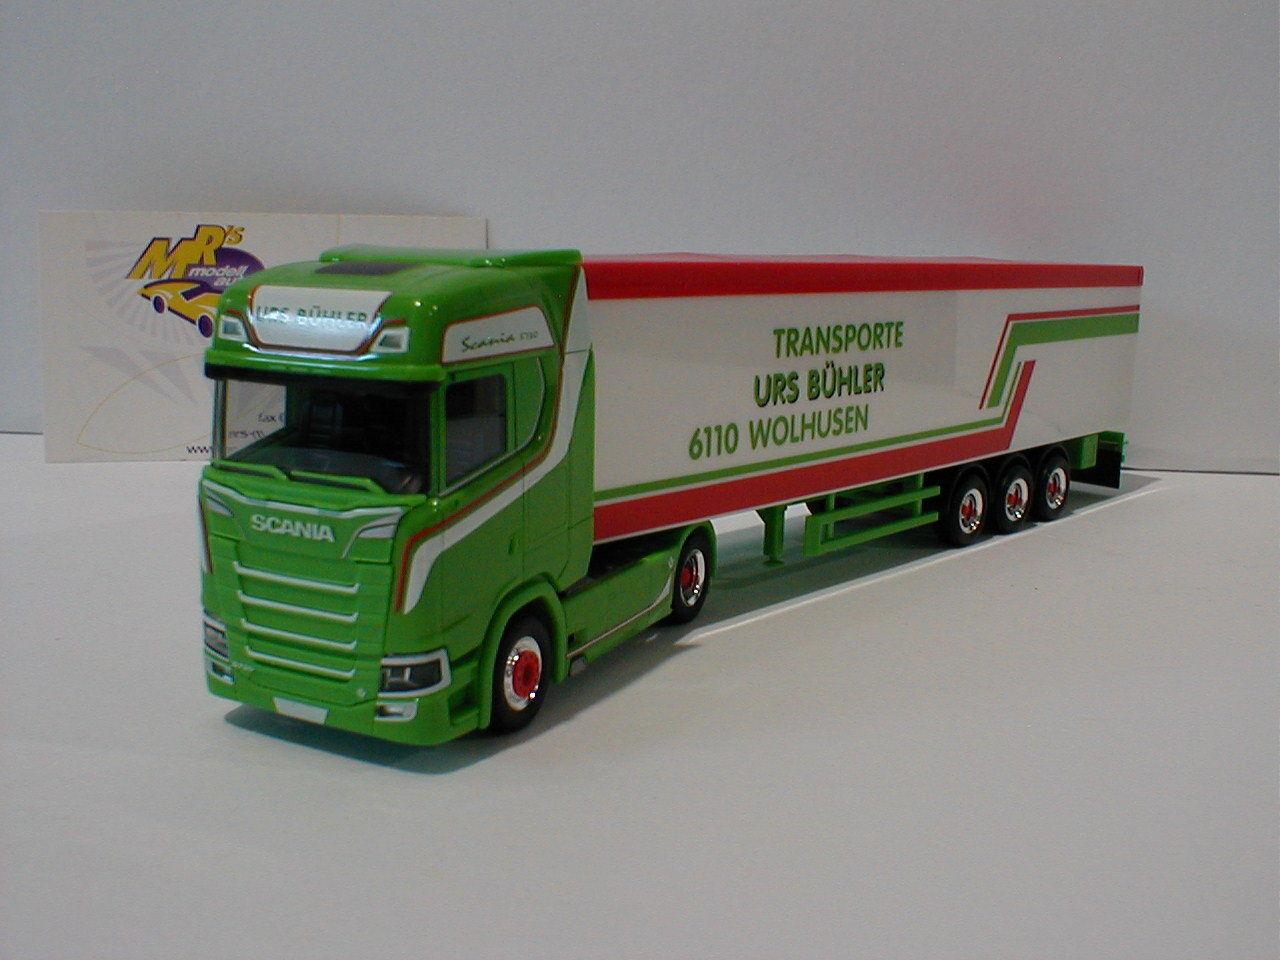 Herpa 307604 - Scania CS 20 HD V8 Schubboden-Sattelzug   Urs Bühler   grün 1 87  | Bunt,